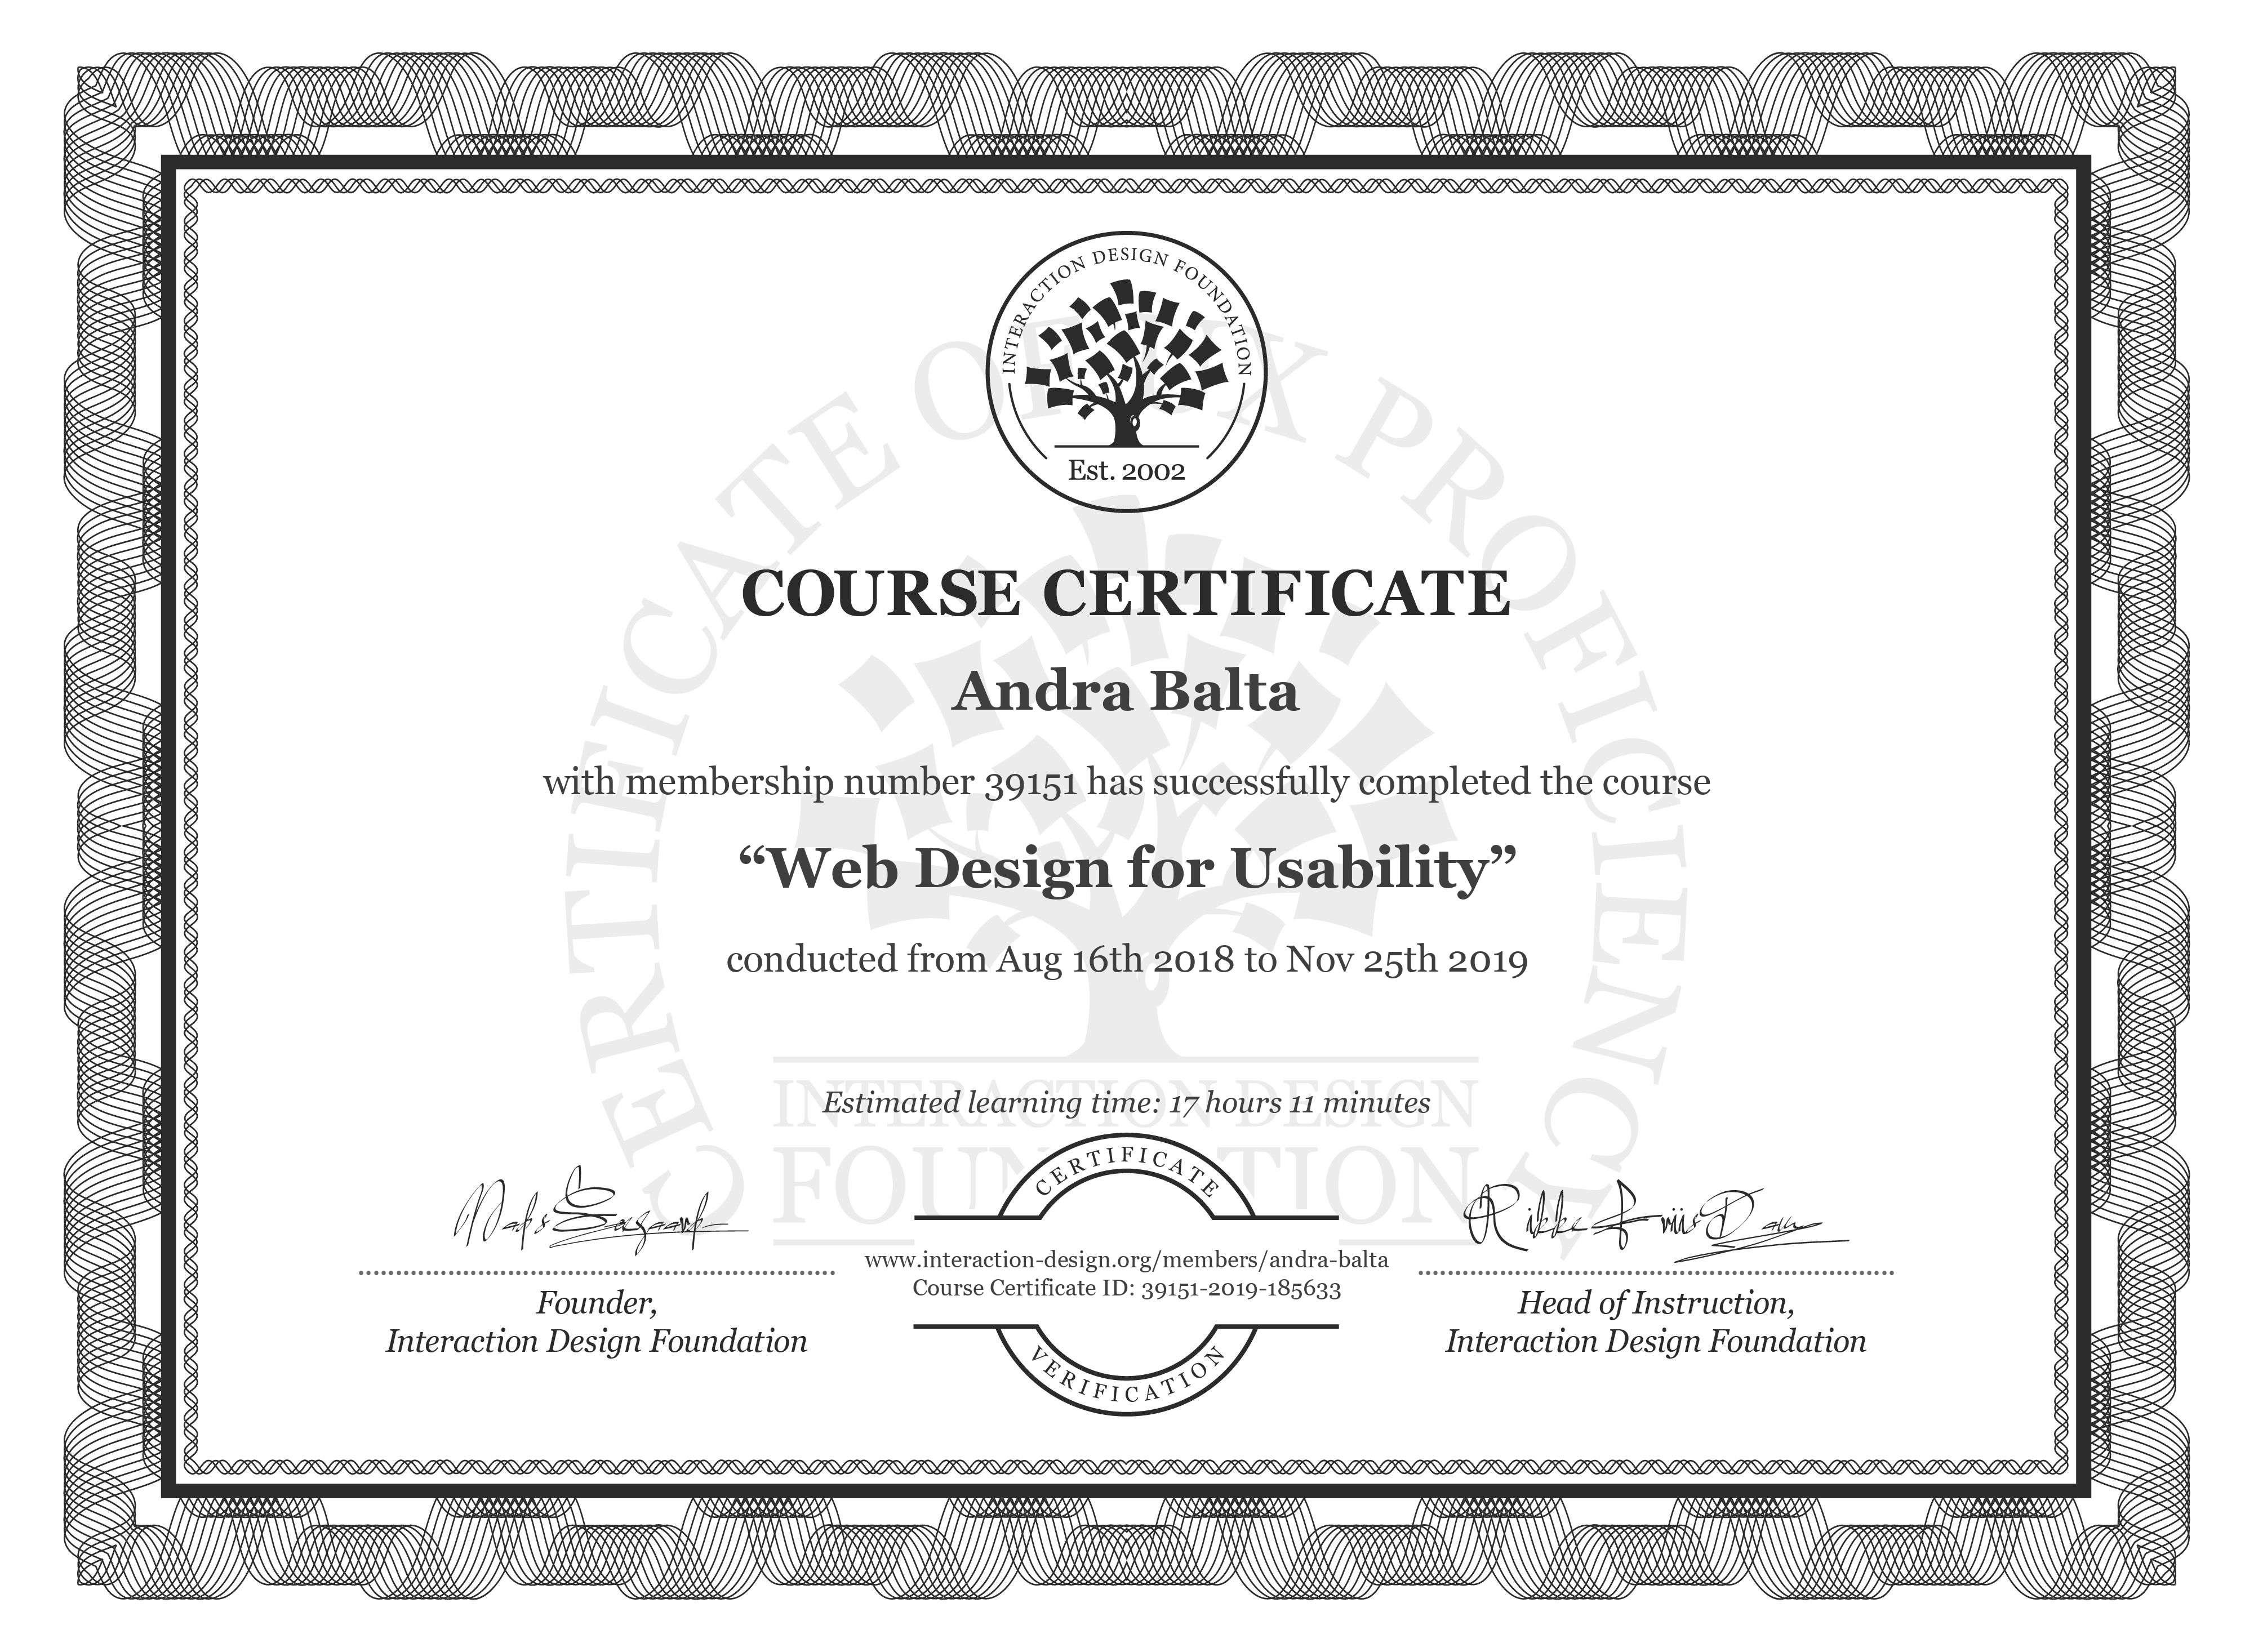 Andra Balta's Course Certificate: Web Design for Usability